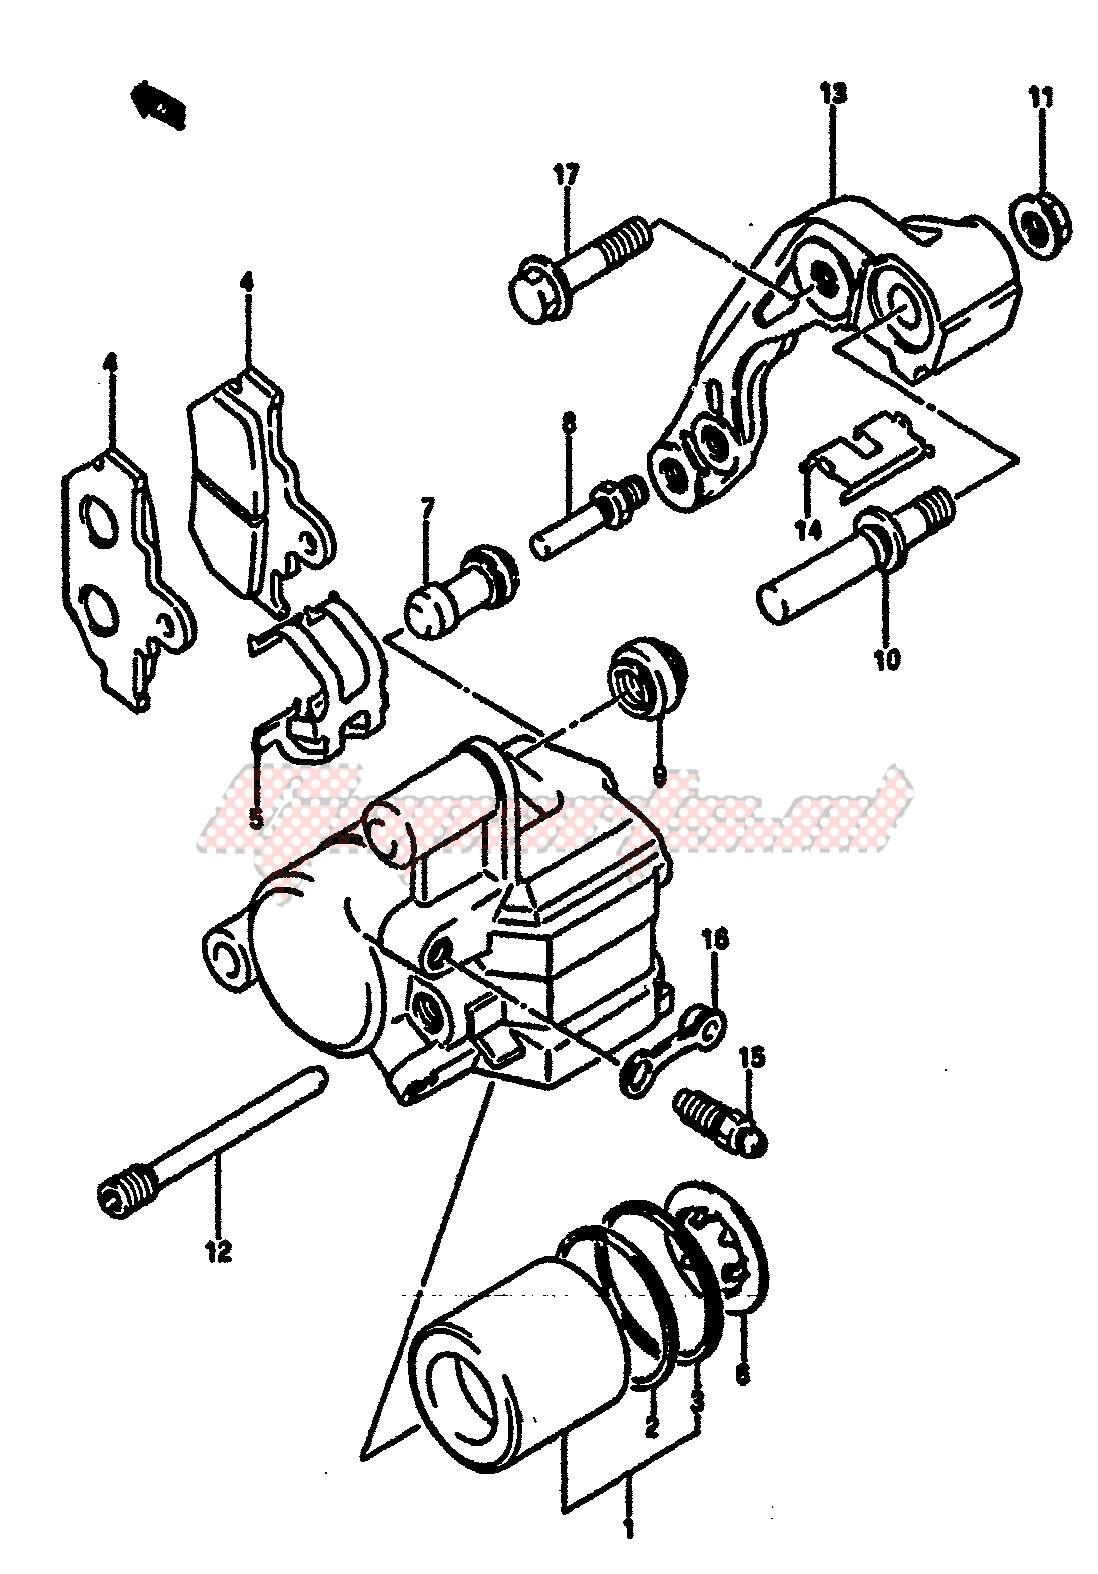 FRONT CALIPER (MODEL F) image